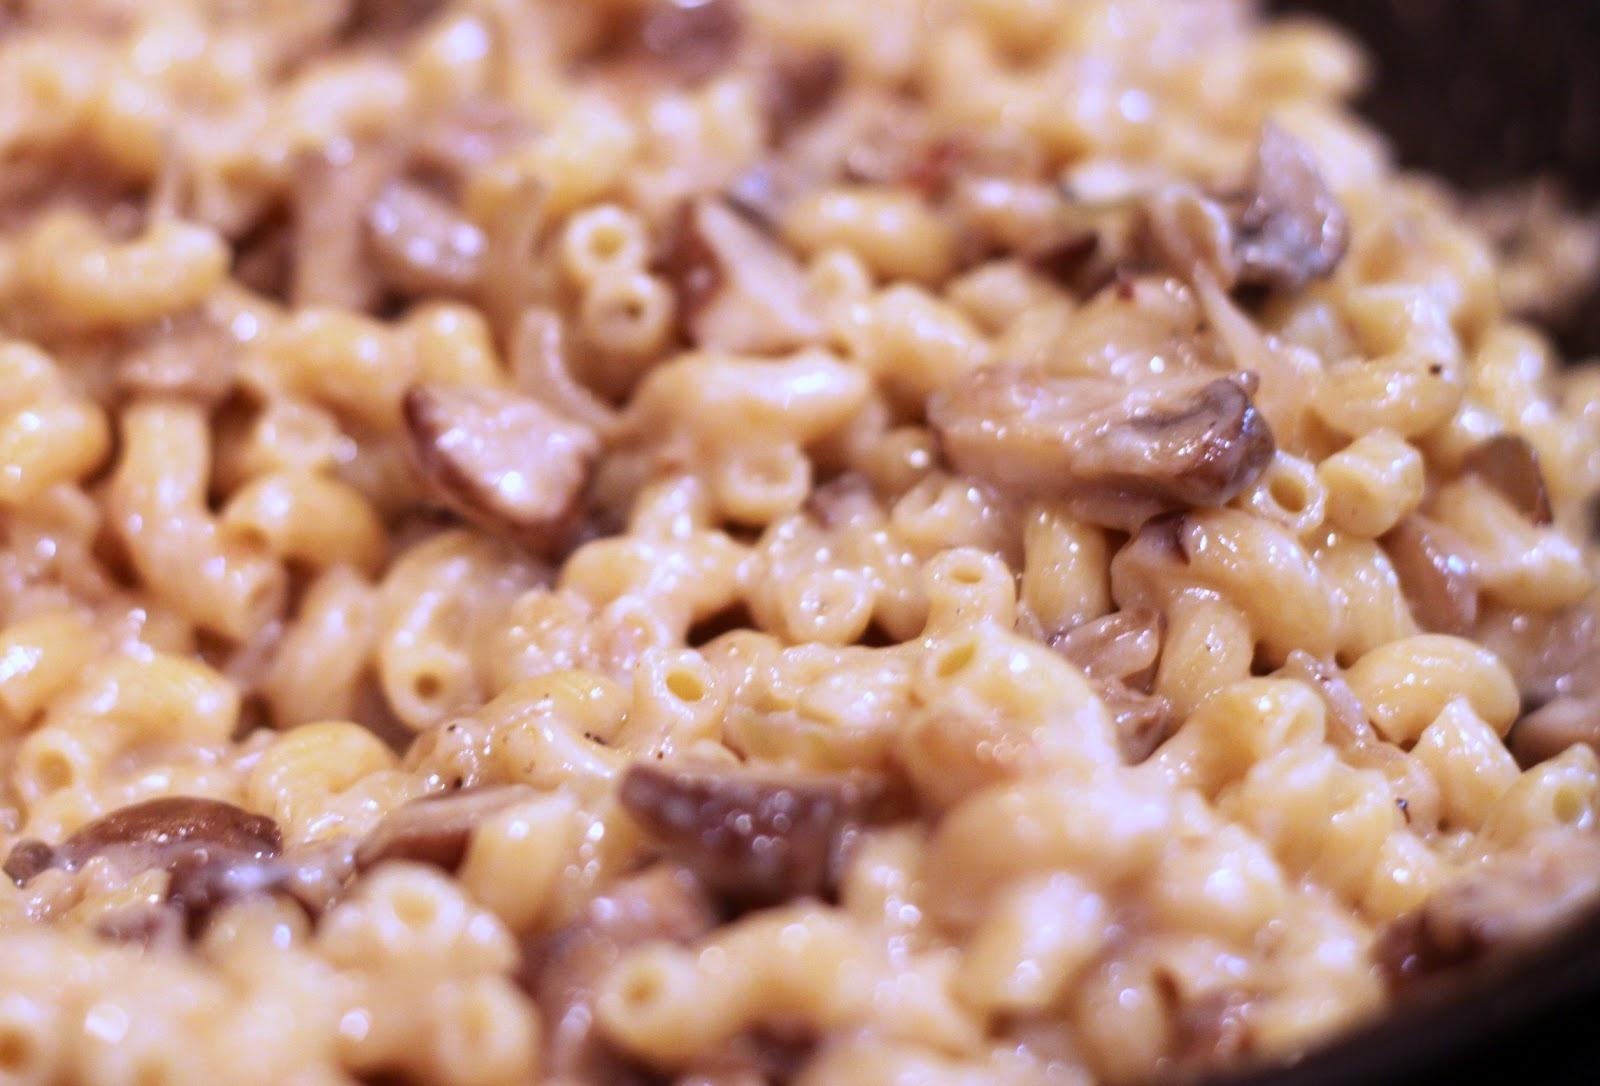 Good Clean Fun: Brie and Mushroom Mac and Cheese